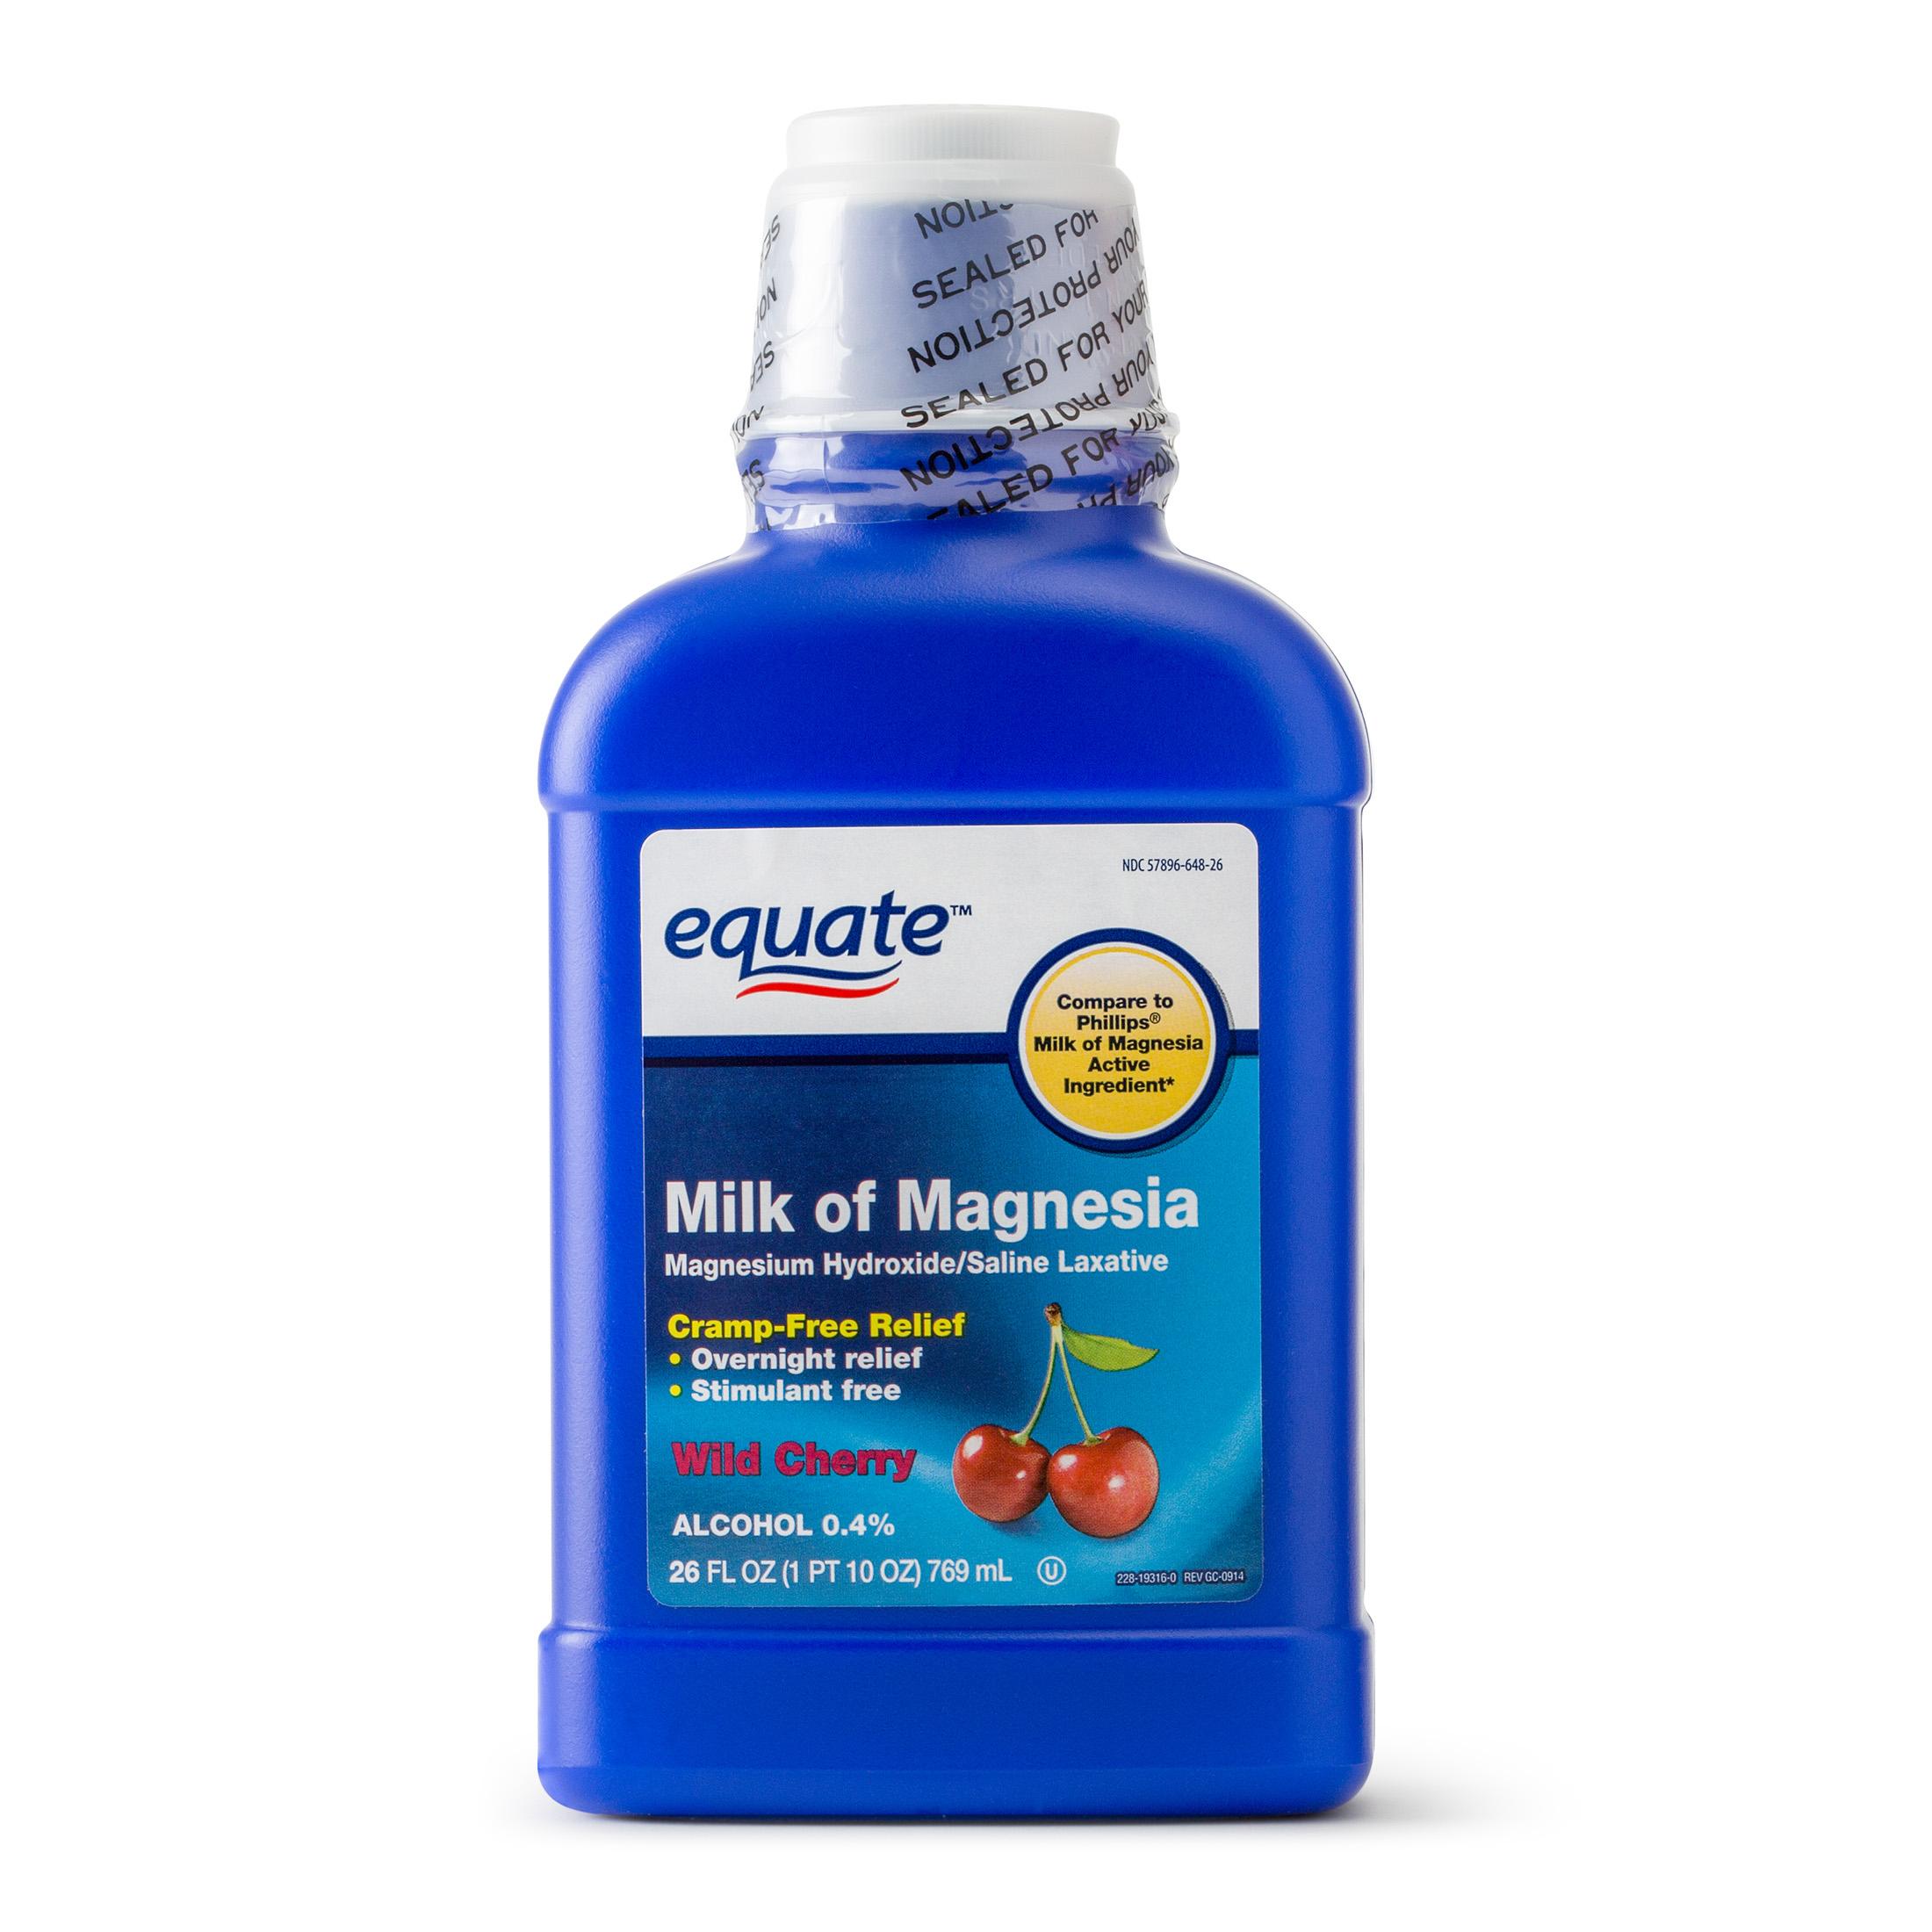 Equate Milk Of Magnesia Saline Laxative Wild Cherry Flavor, 1200 mg, 26 Oz